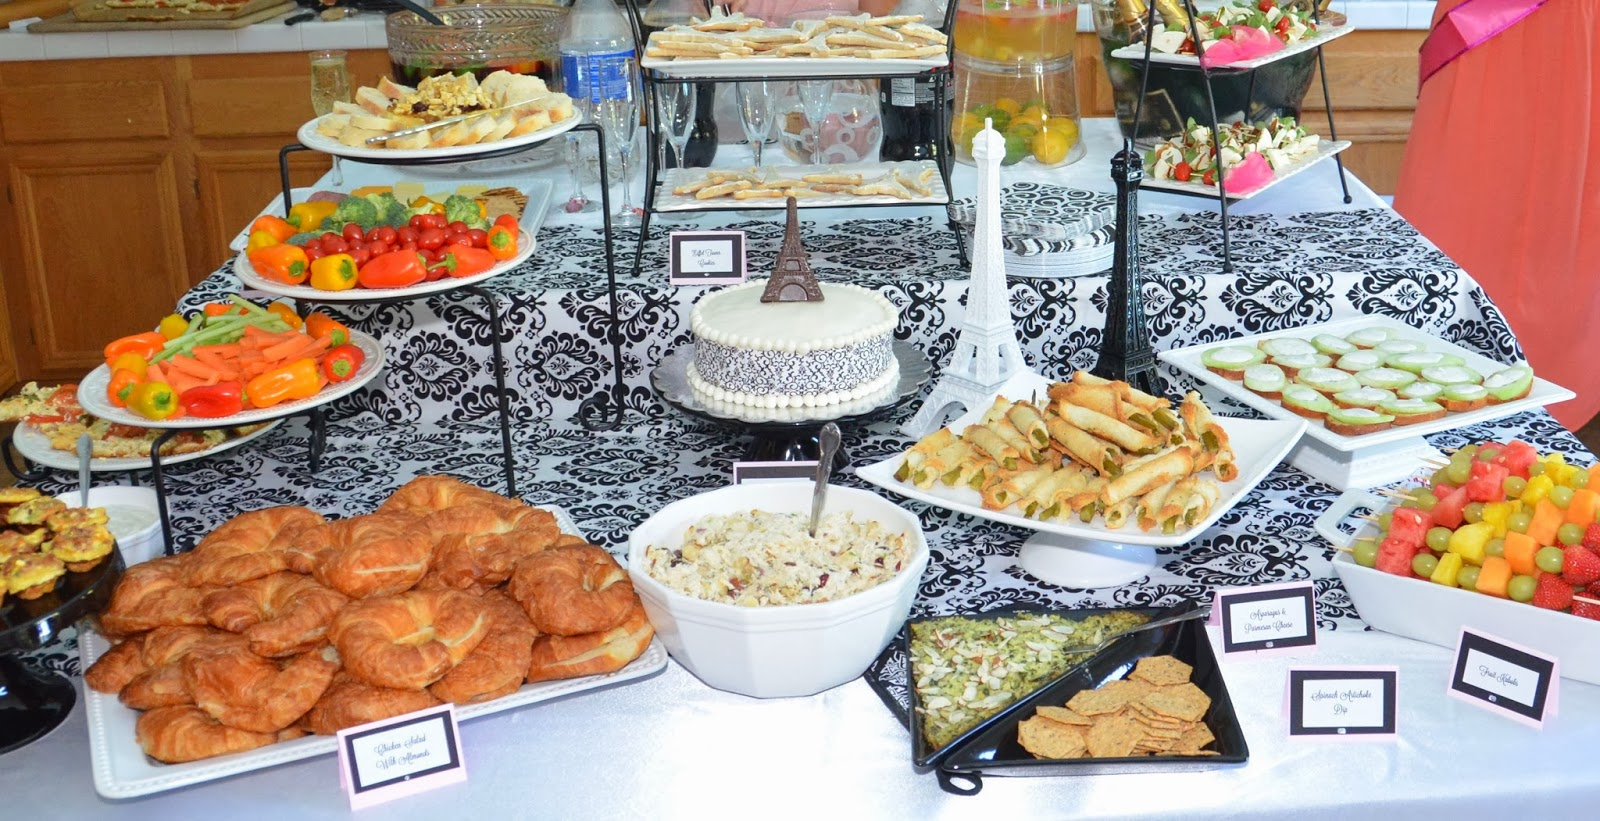 Eiffel Tower Theme Bridal Shower Food Table